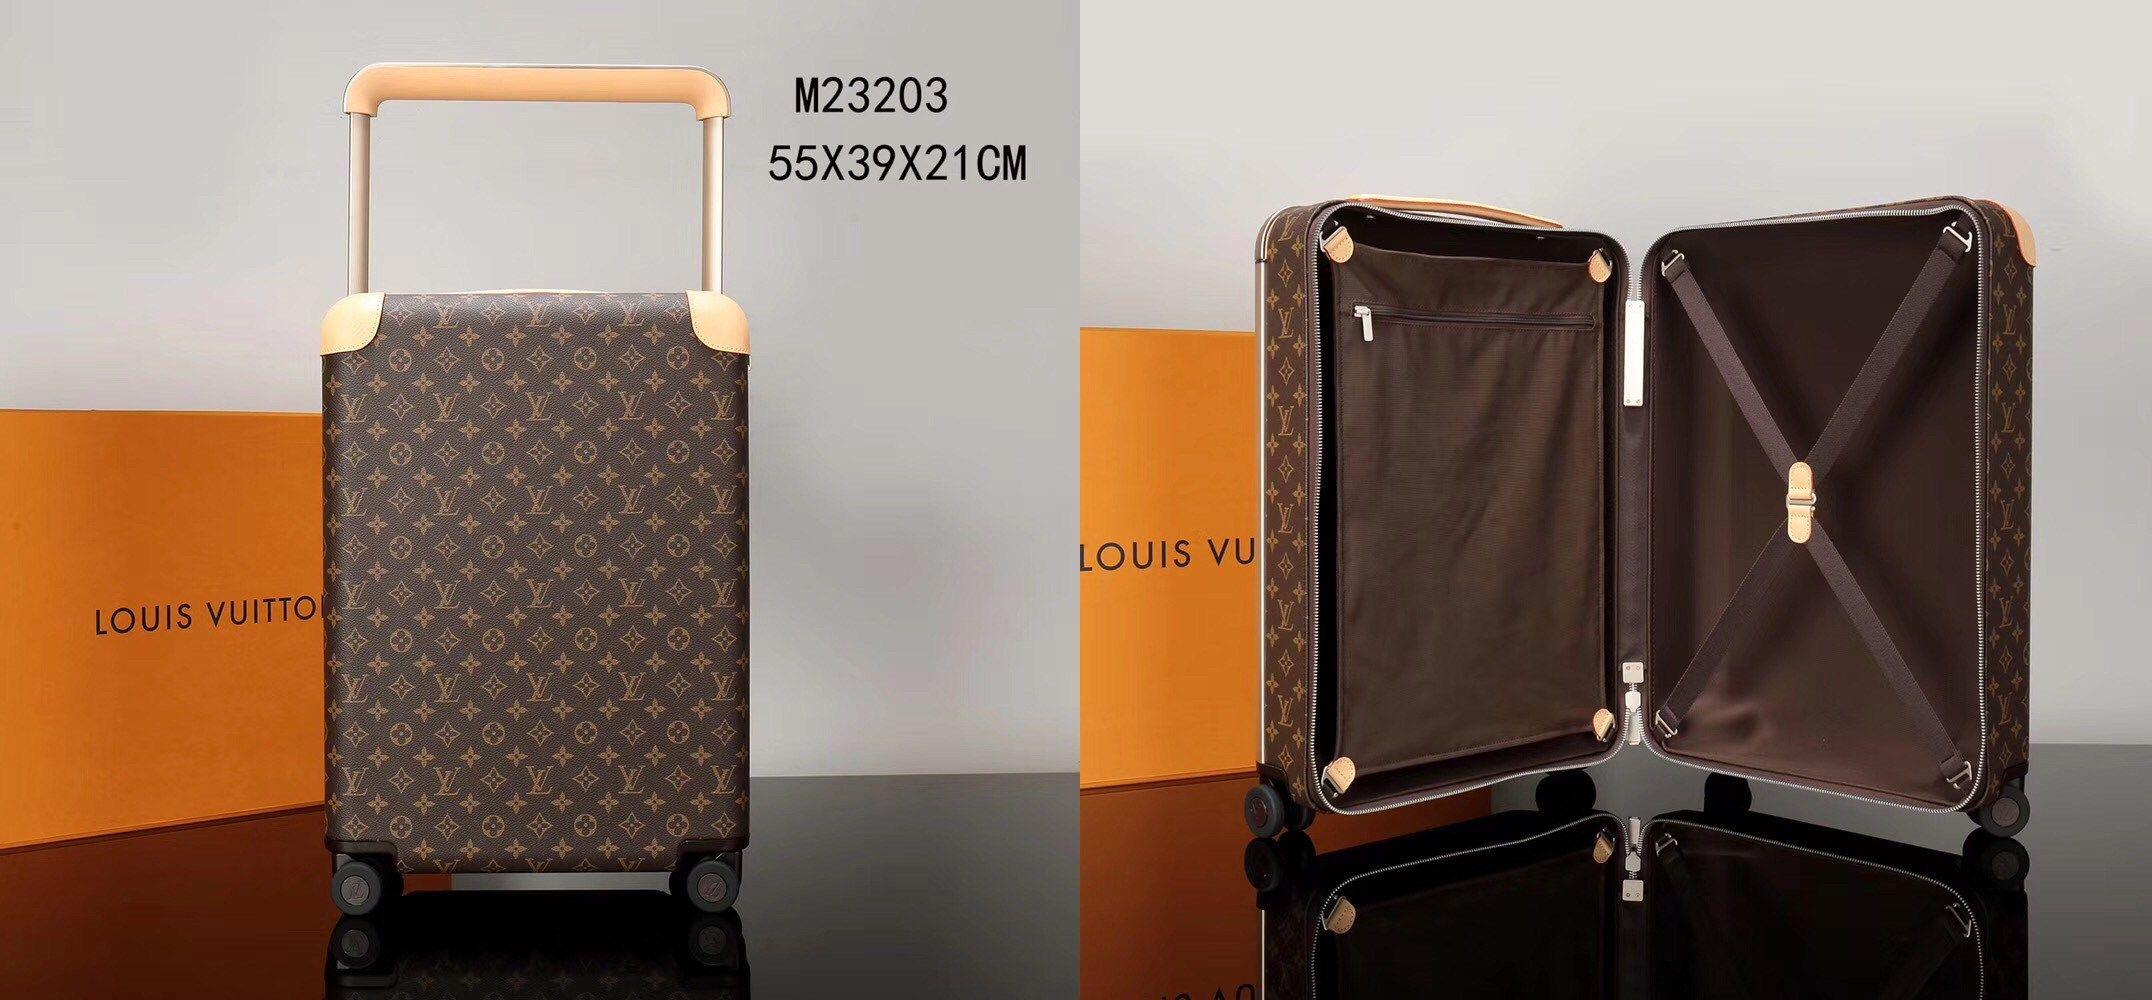 b342d2060d5c LOUIS VUITTON HORIZON 55 rolling luggage M23203